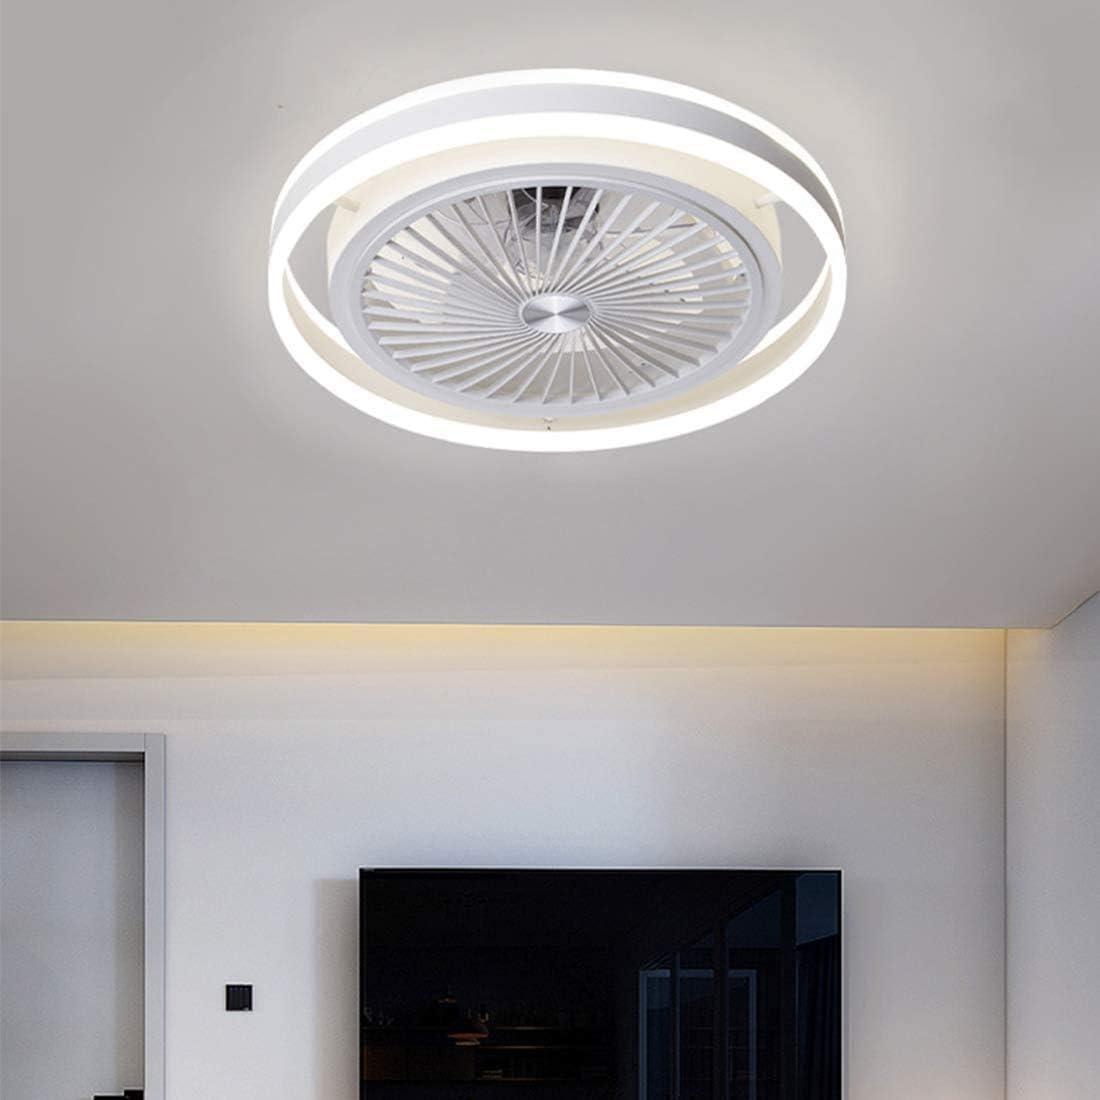 Ventilador de techo con iluminación, con mando a distancia, regulable, velocidad del viento regulable, 40 W, moderno, LED, silencioso, lámpara colgante para dormitorio, salón, oficina, color blanco